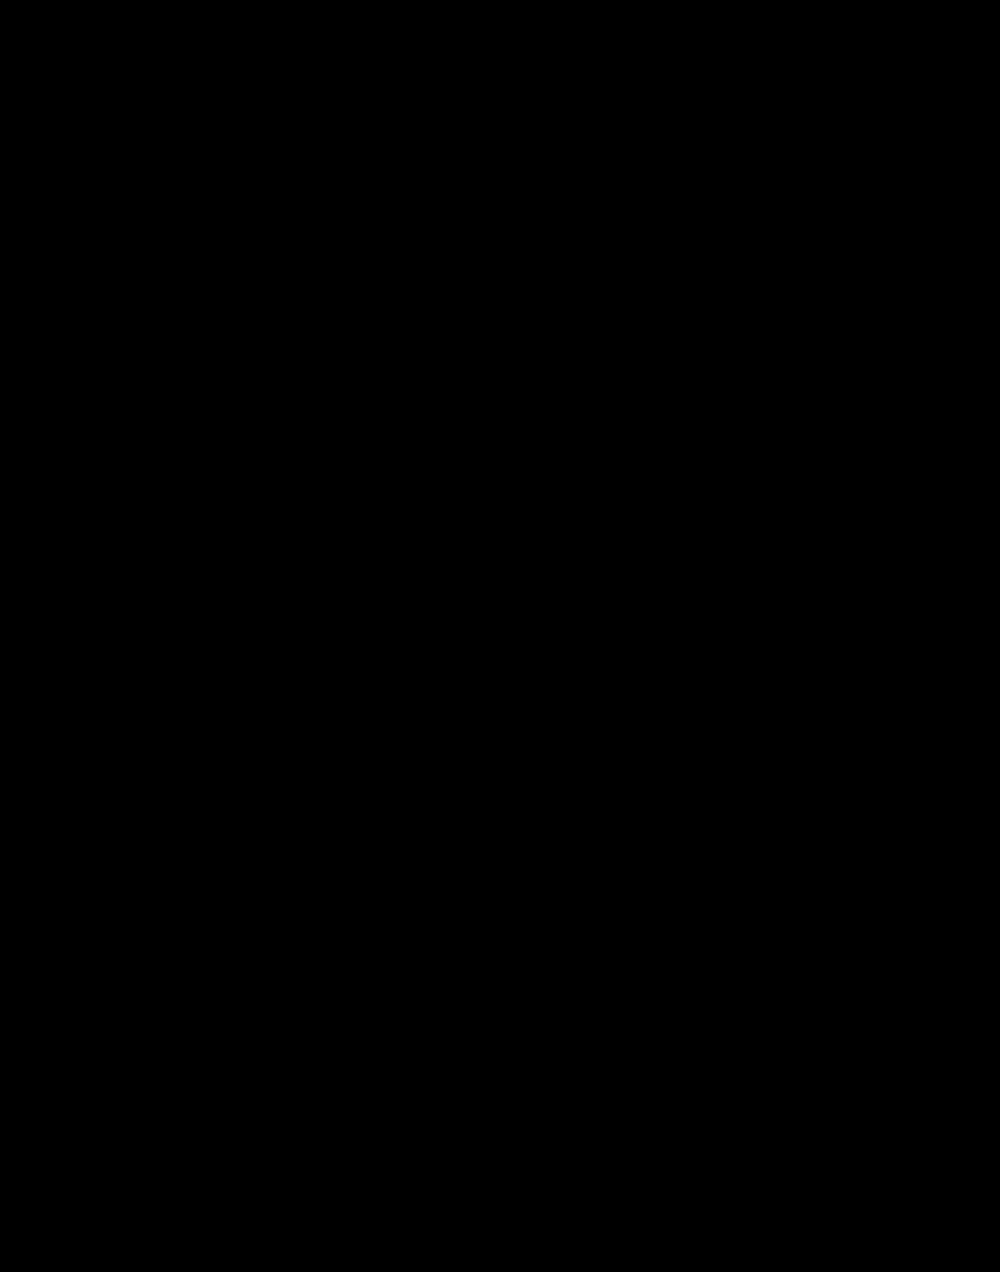 virt_logo_black-01.png